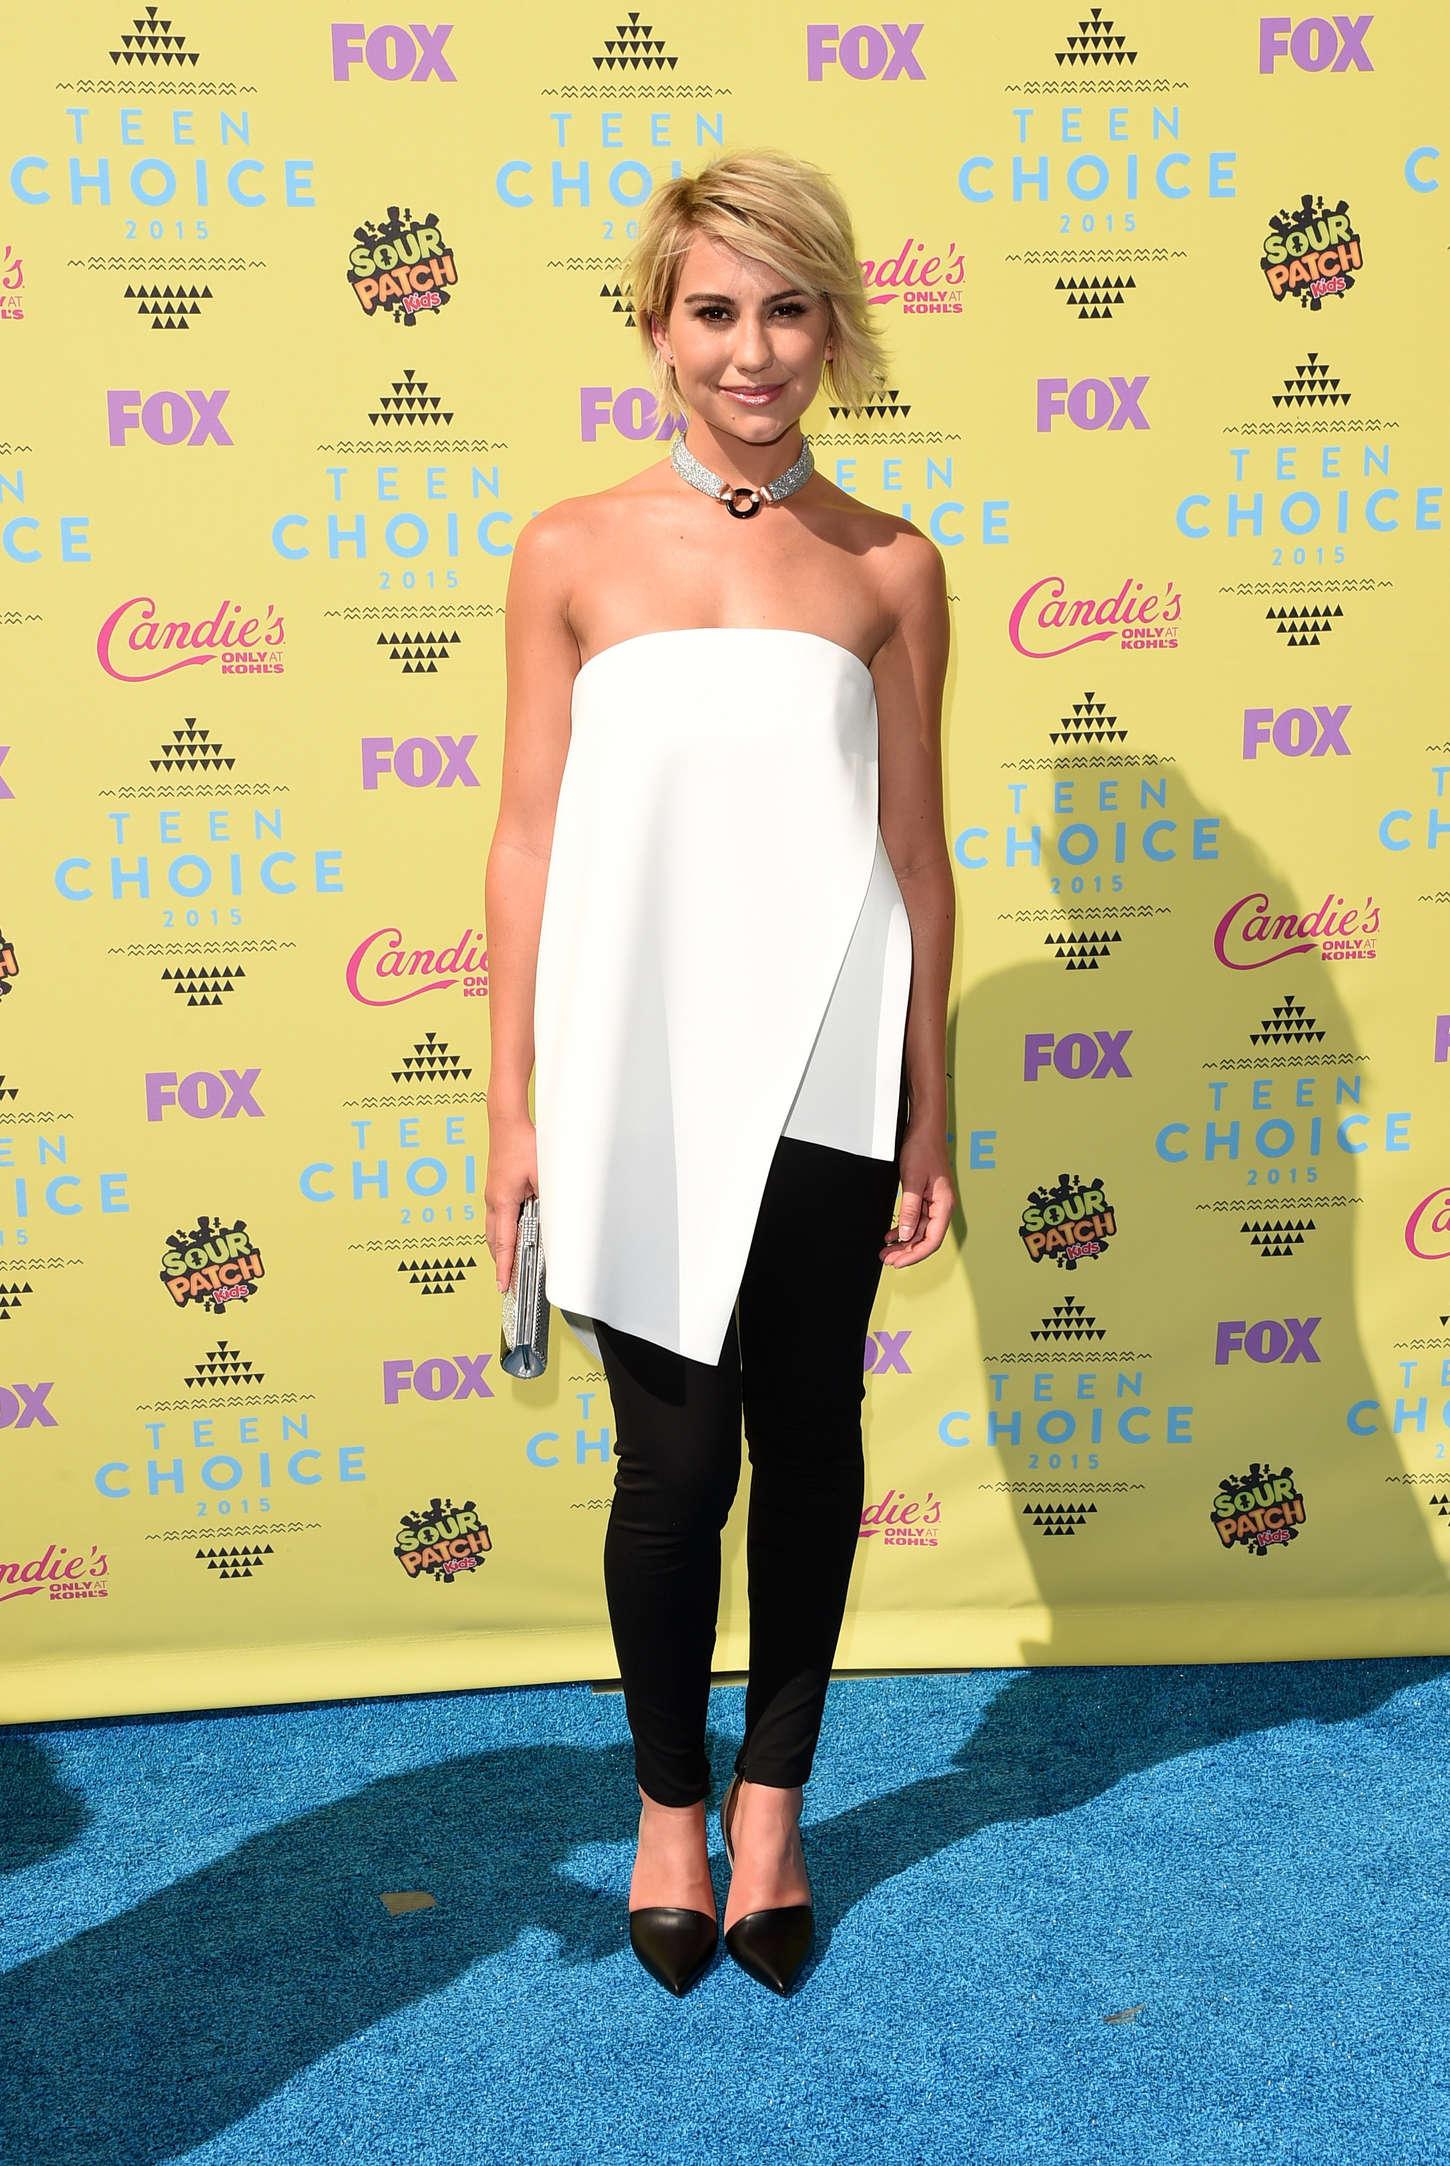 Teen Choice Awards 2017: Red Carpet Arrivals Photos m 49